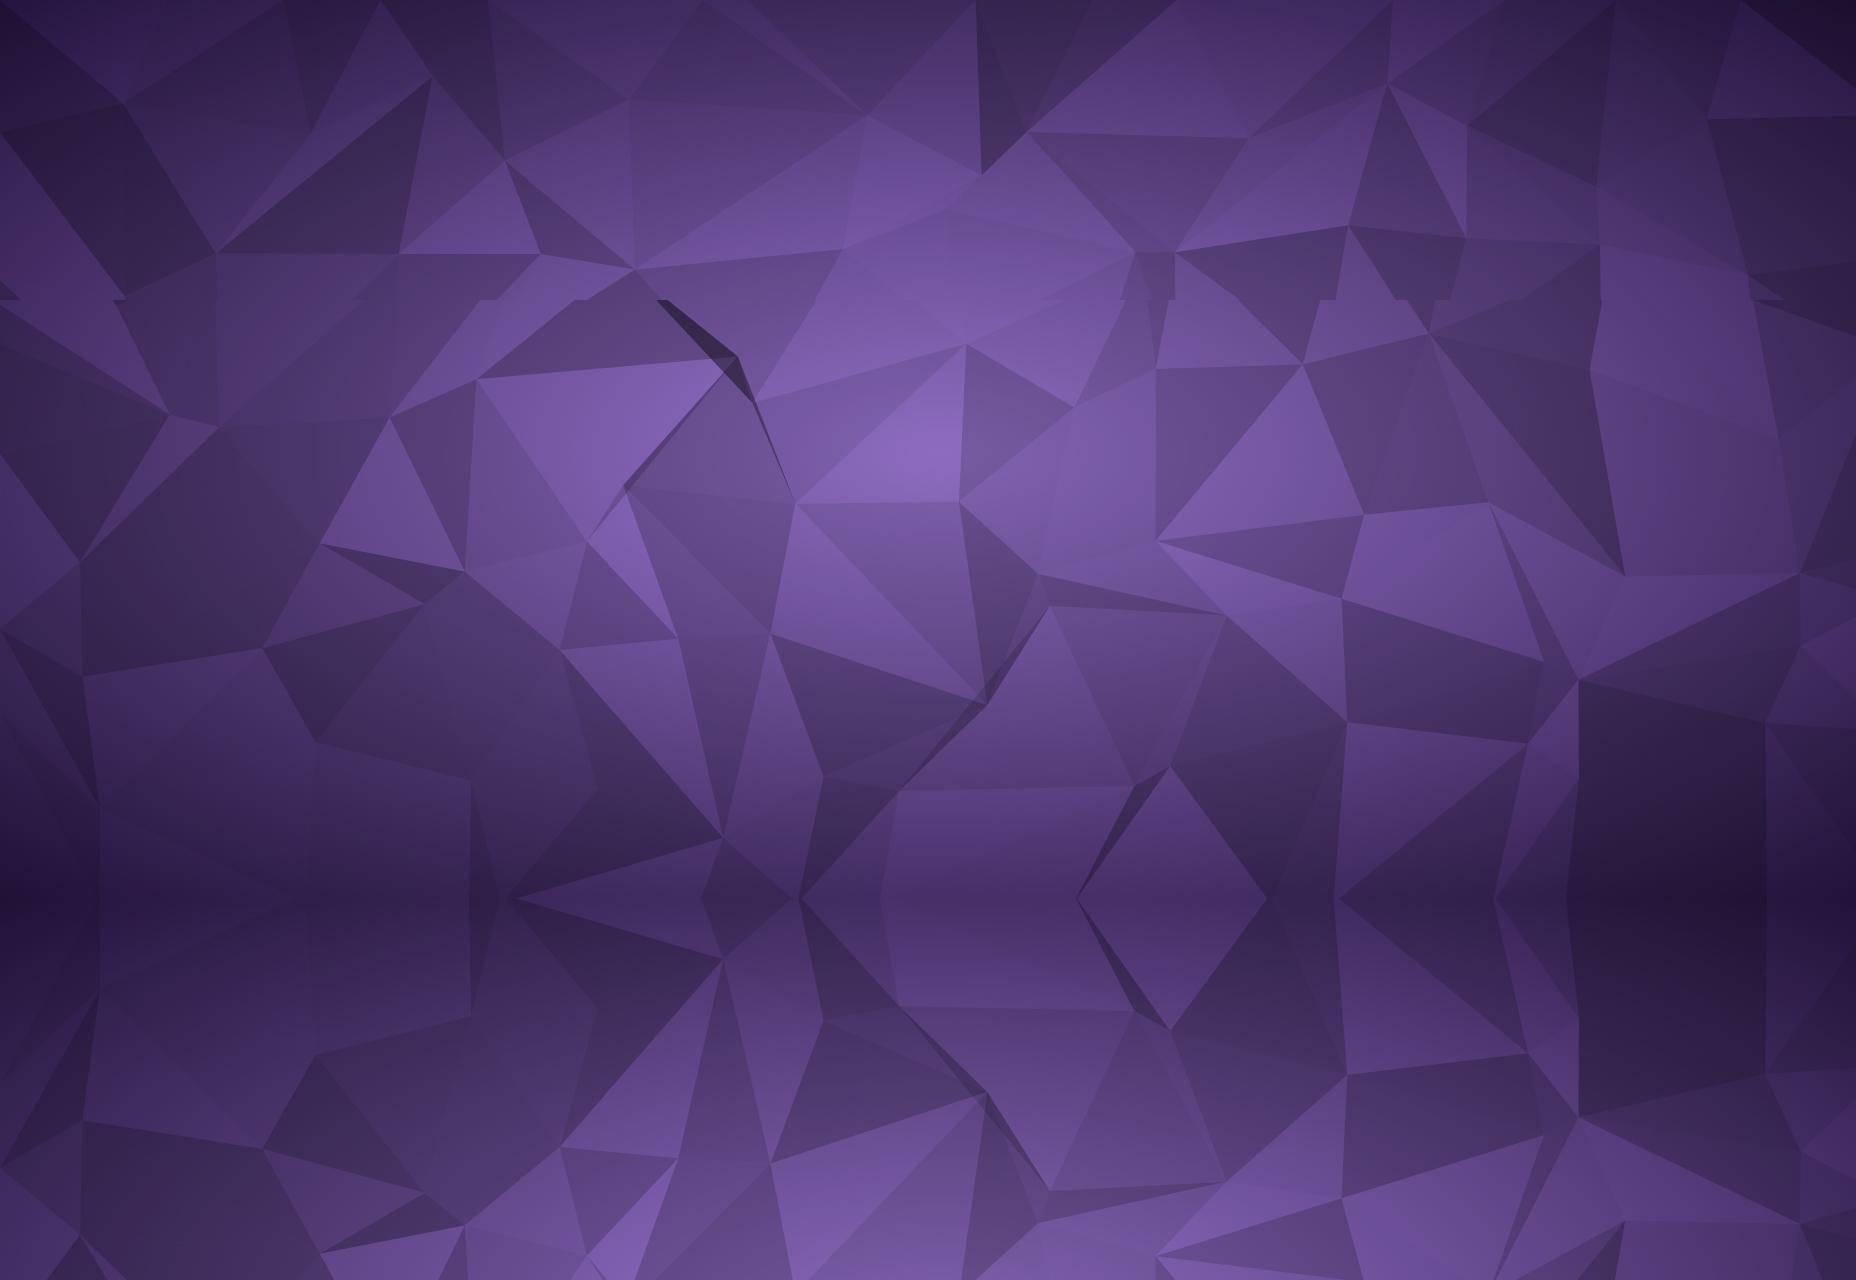 50 incredible freebies for web designers july 2015 webdesigner depot animated low poly svg background generator malvernweather Images